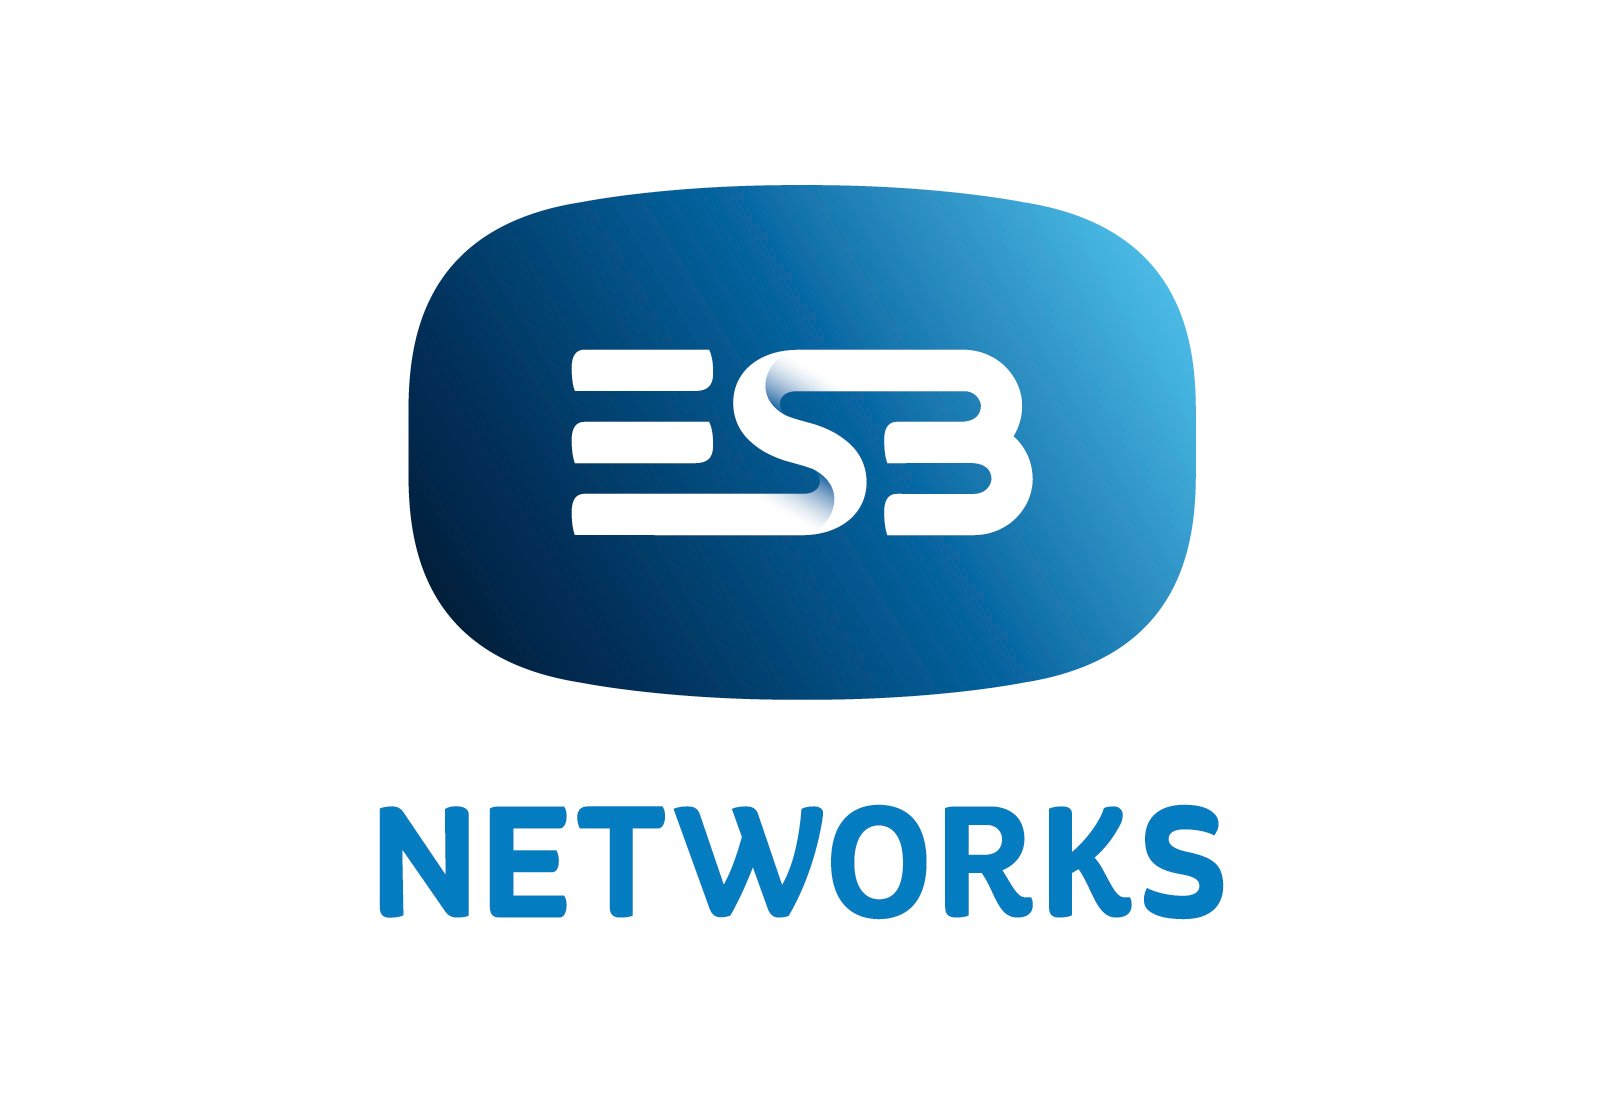 @ESBNetworks